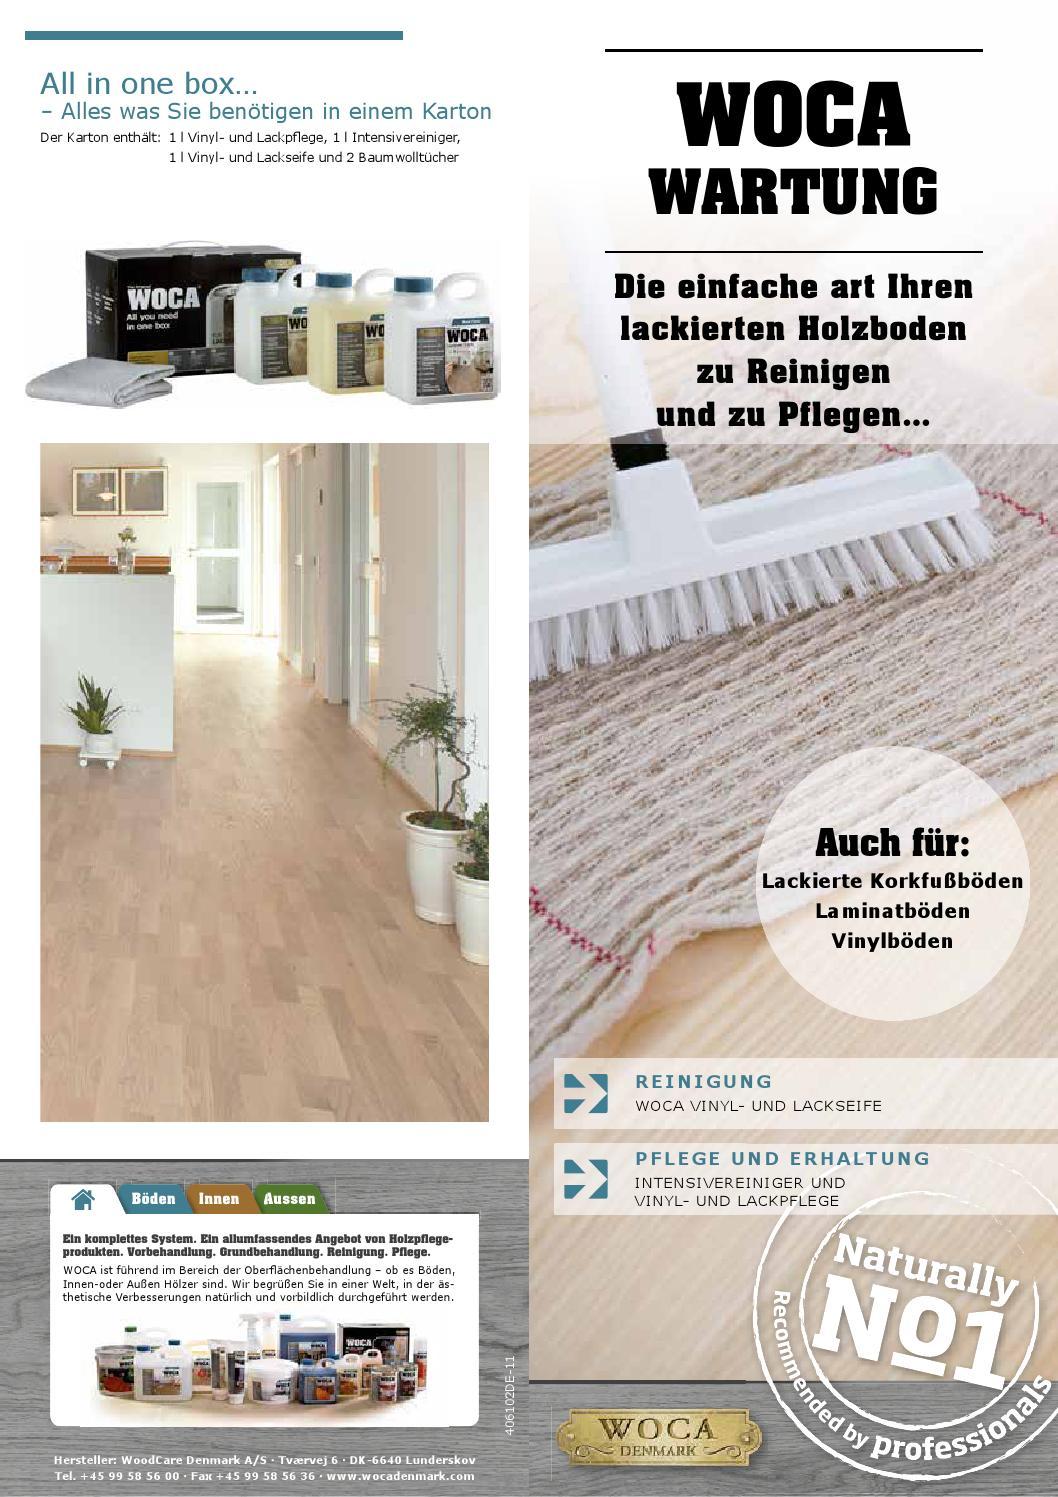 woca wartung laminat vinyl und lack by nordholz issuu. Black Bedroom Furniture Sets. Home Design Ideas